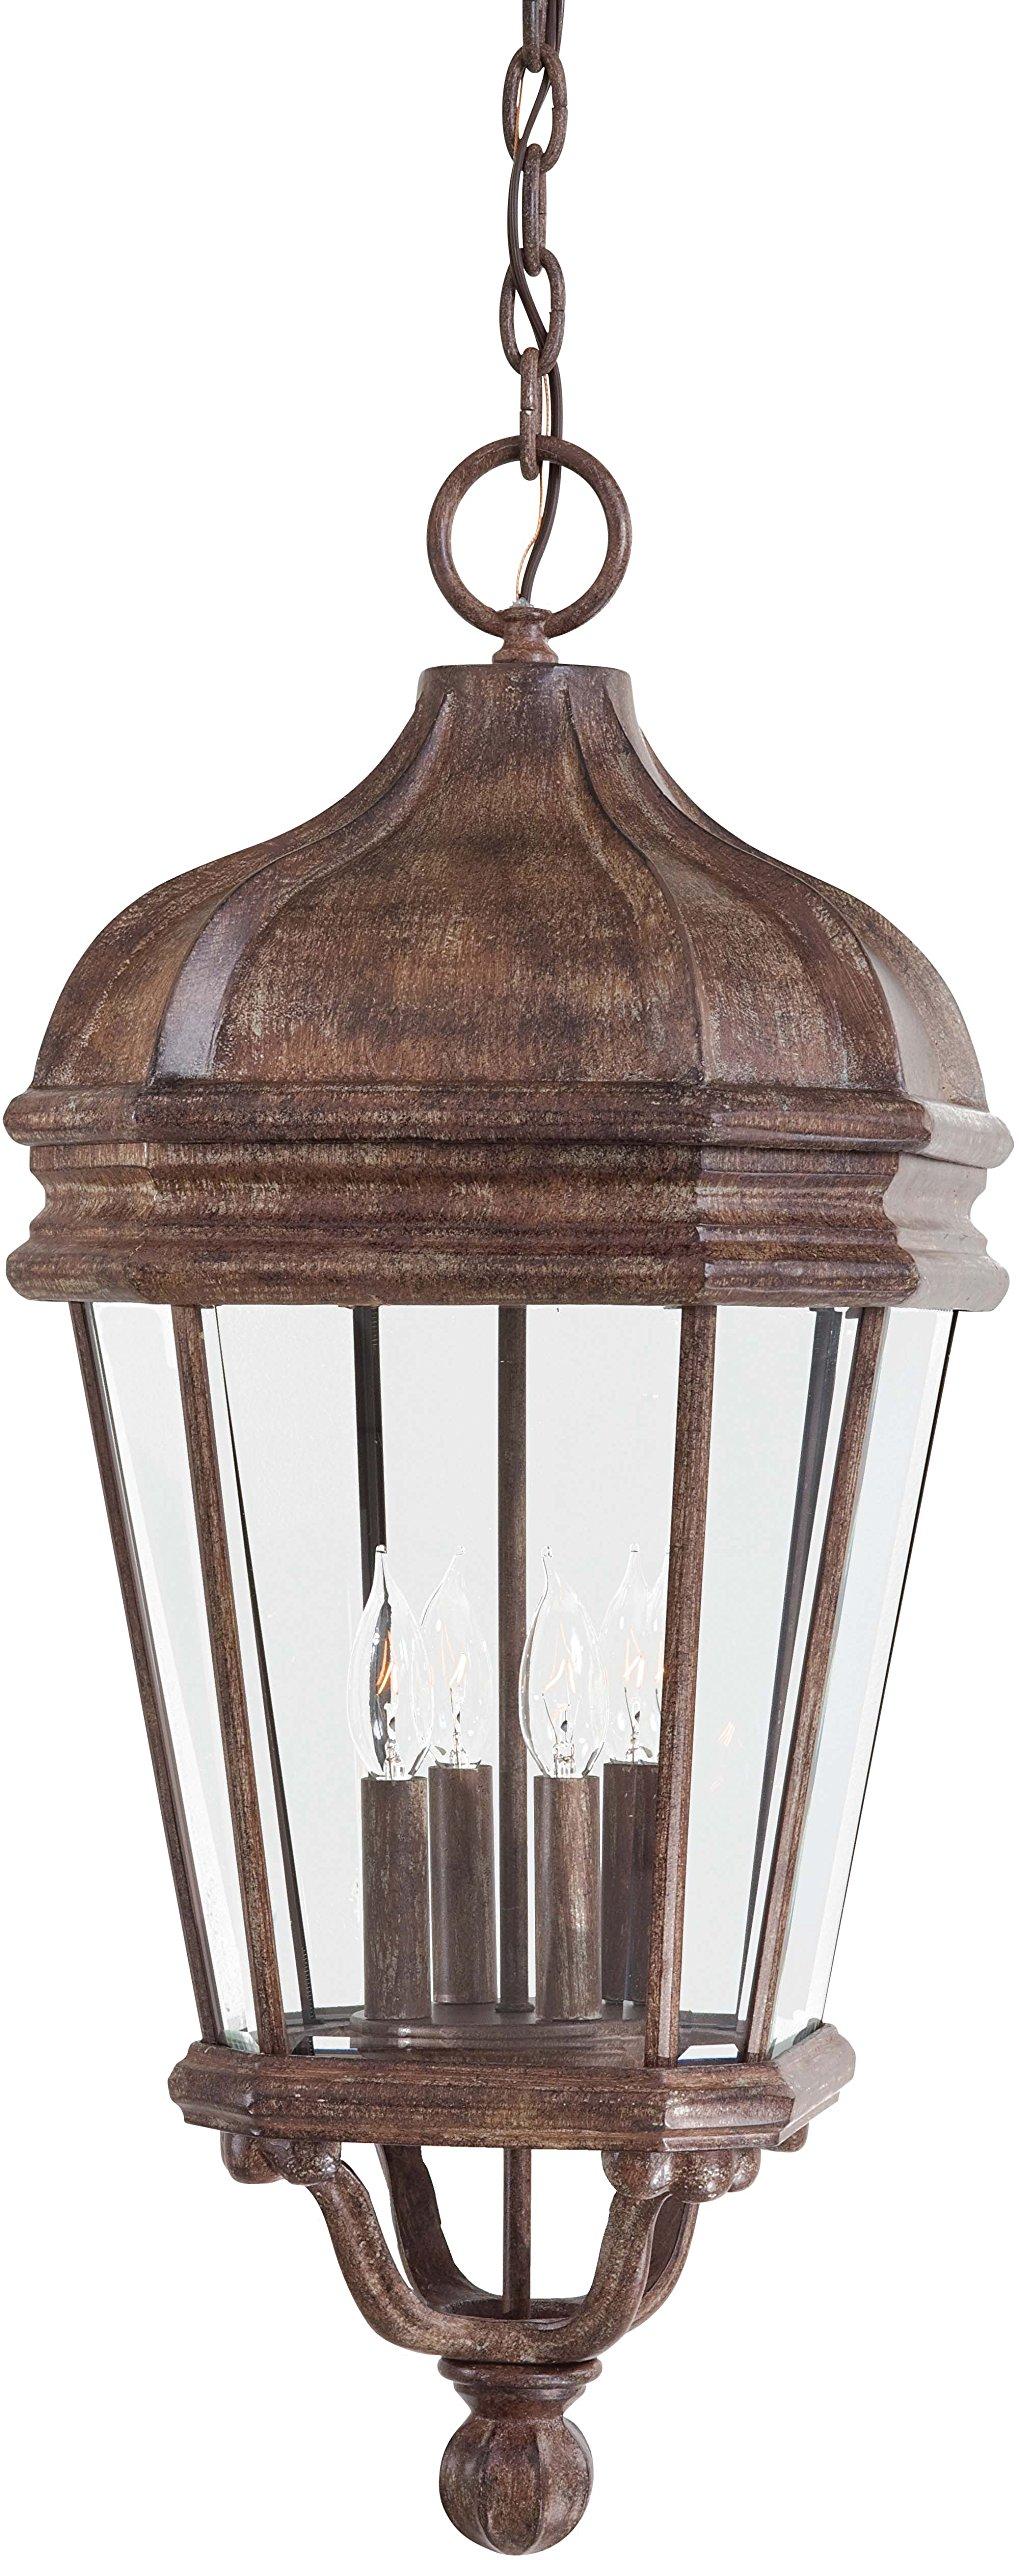 Minka Lavery Outdoor Pendant Lighting 8694-61, Harrison Cast Aluminum Ceiling Lighting for Patio, 160 Watts, Rust